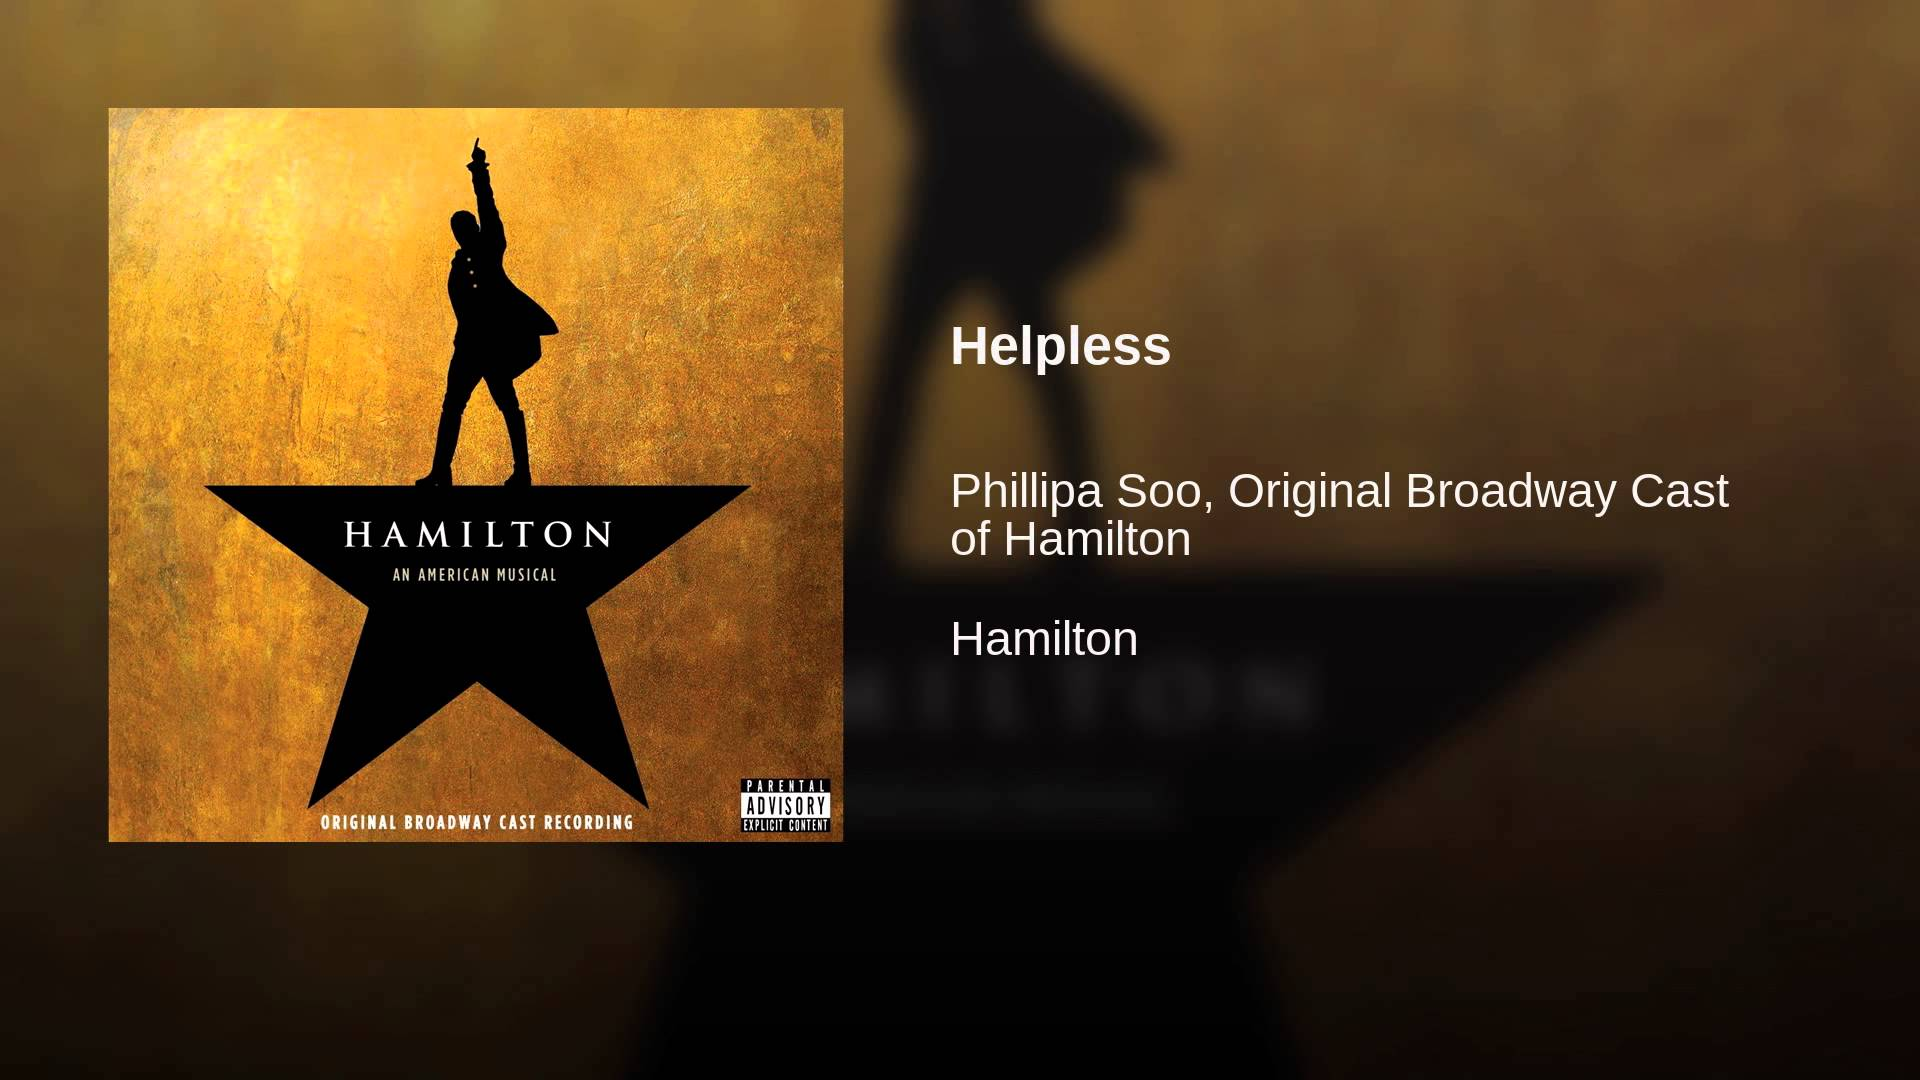 Lin-Manuel Miranda: Helpless/Satisfied